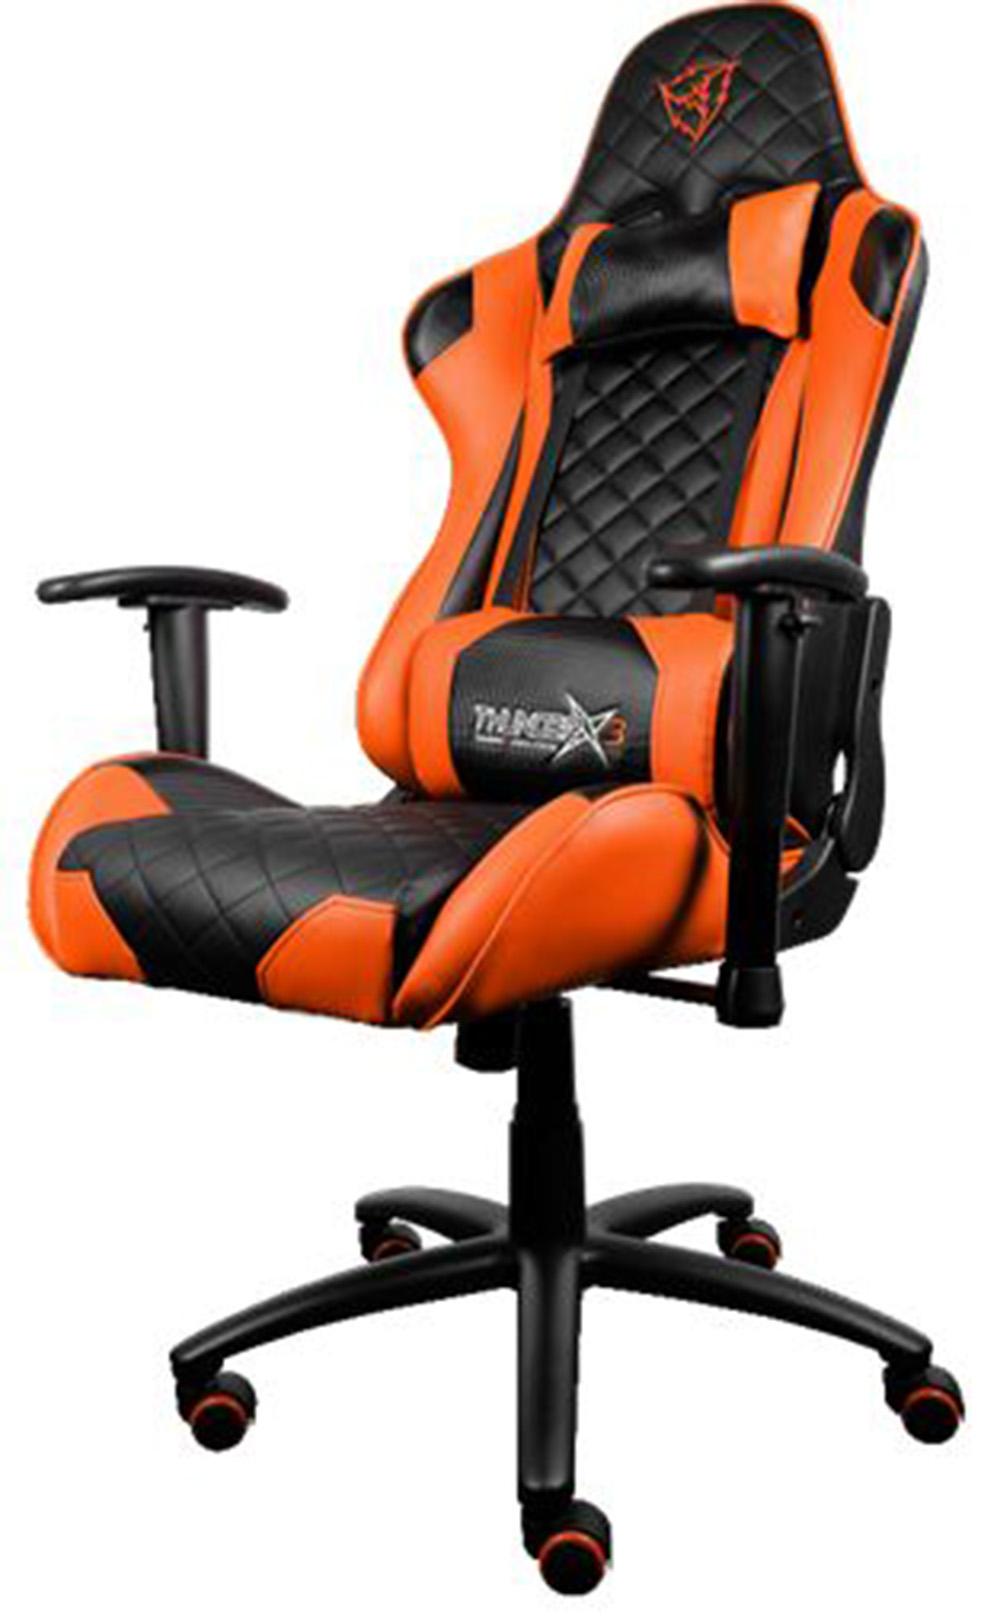 ThunderX3 TGC12 Series Gaming Chair Black/Orange